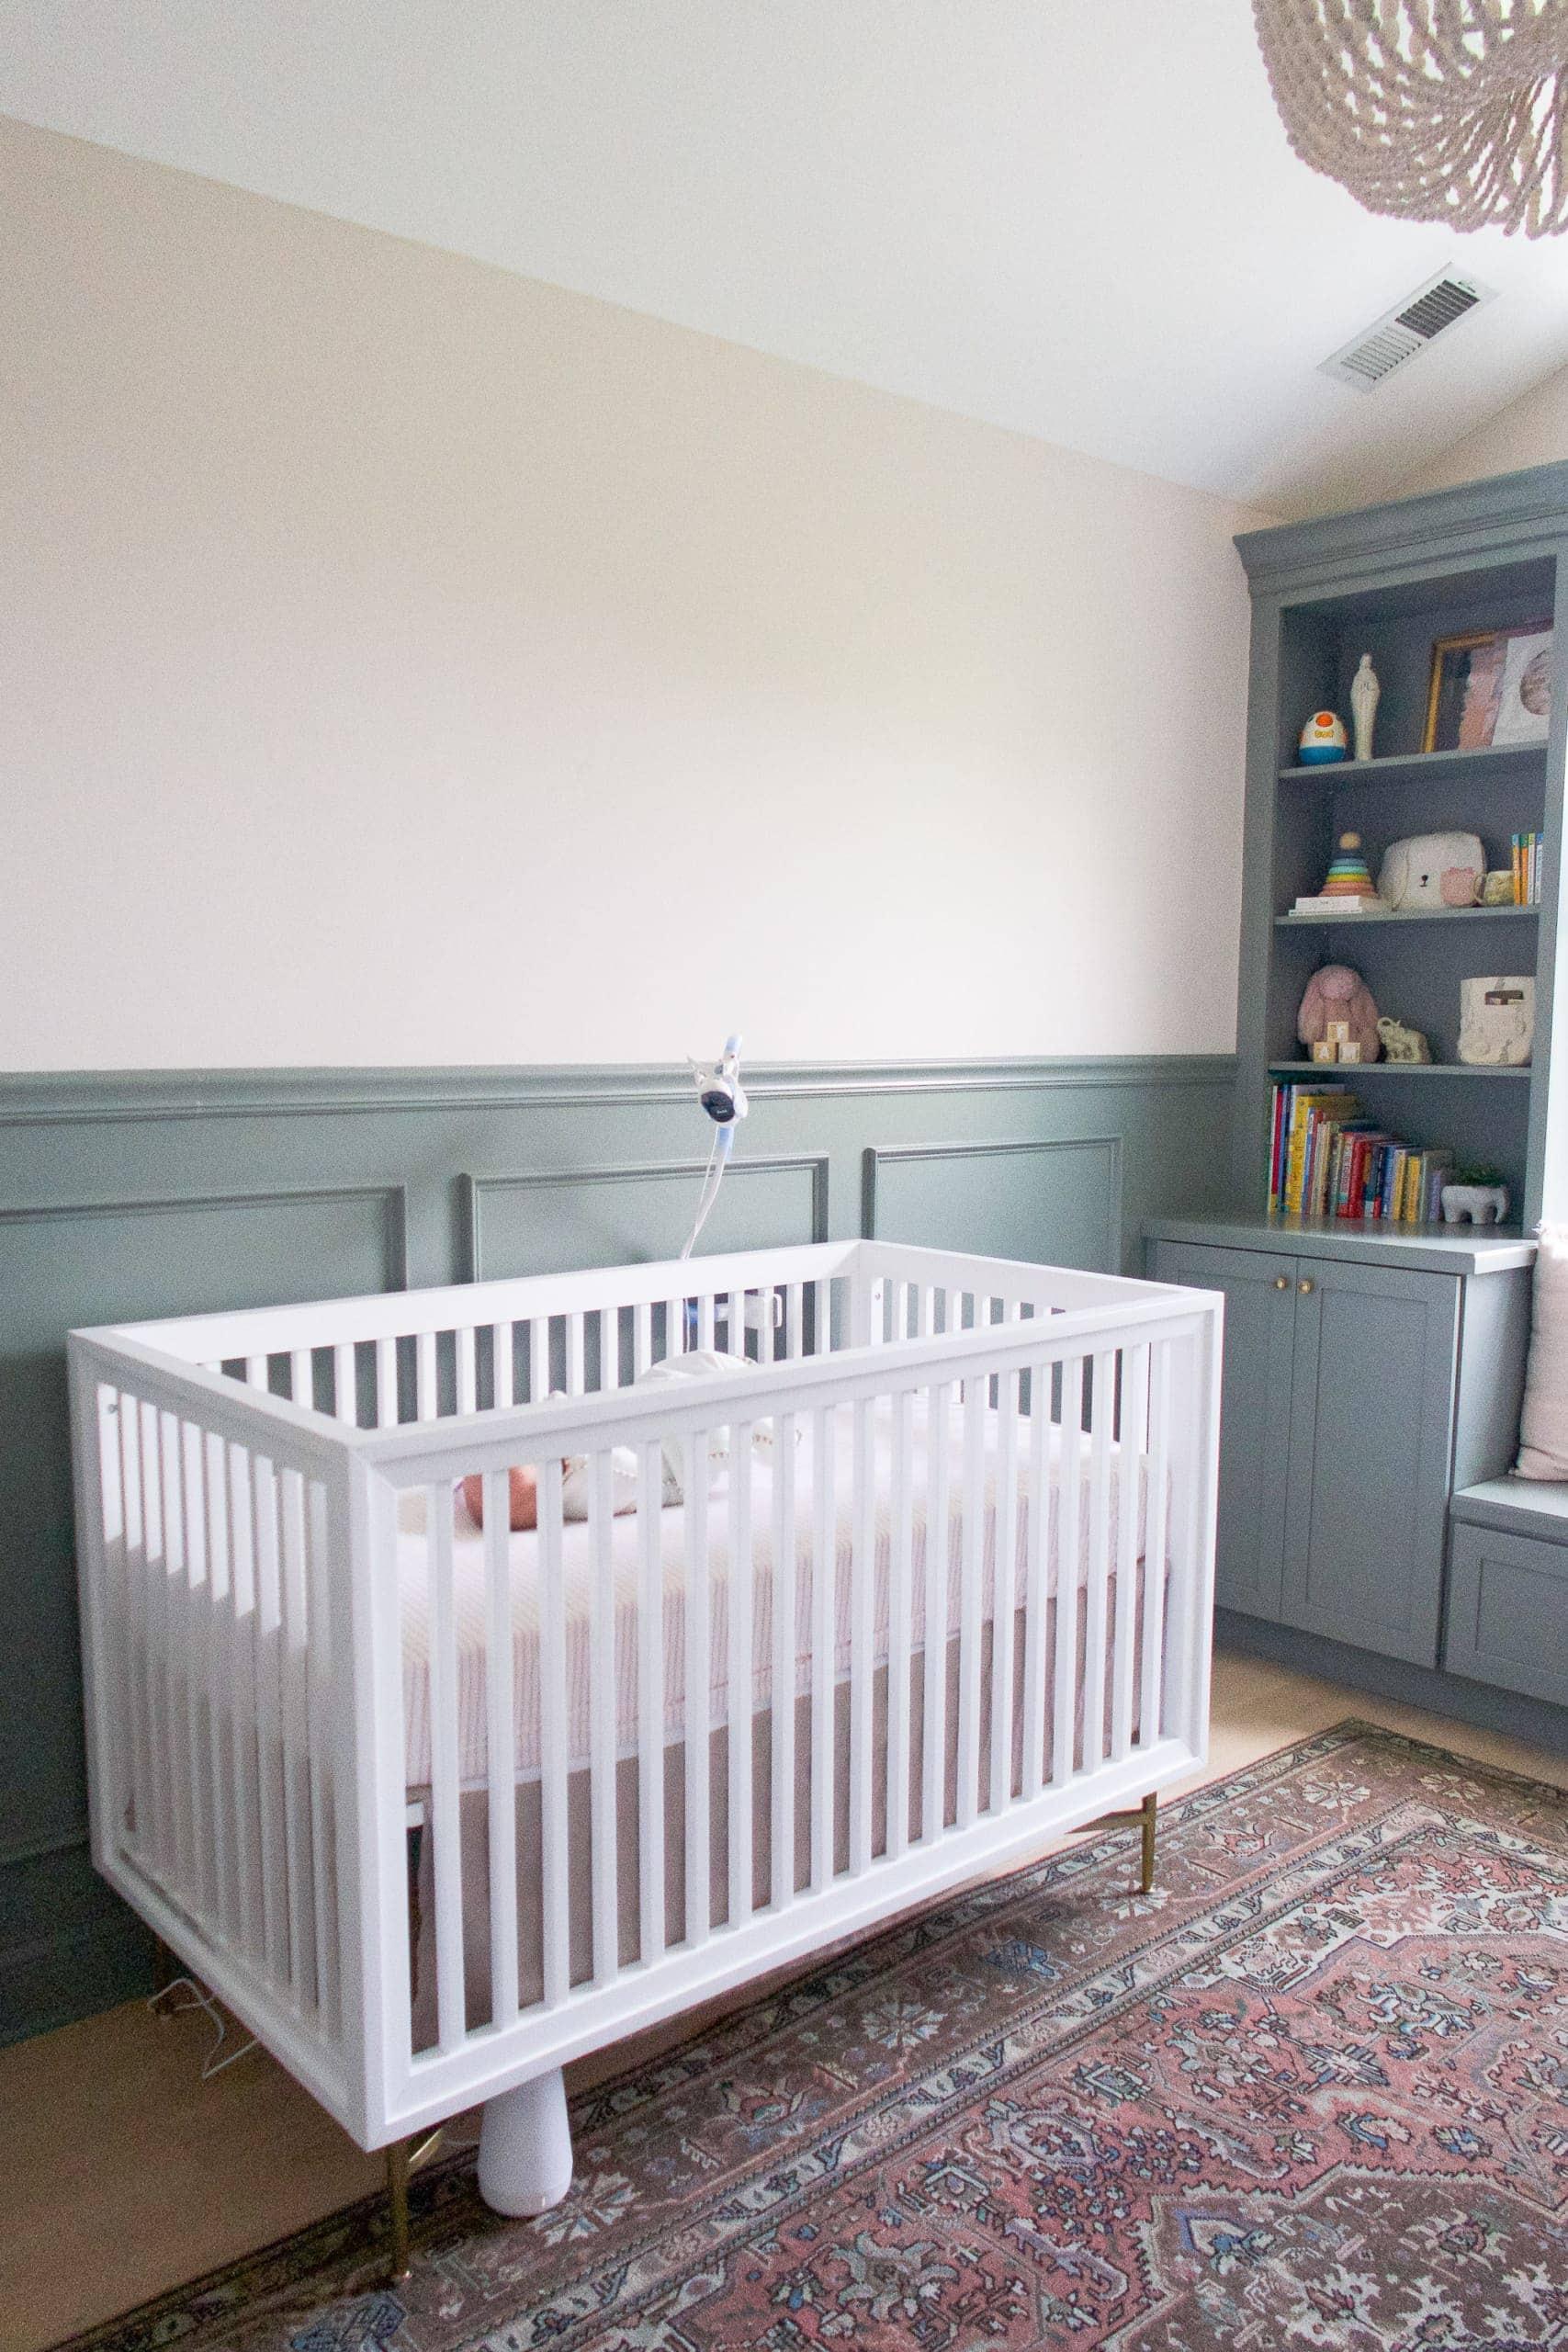 Rory sleeping in her crib